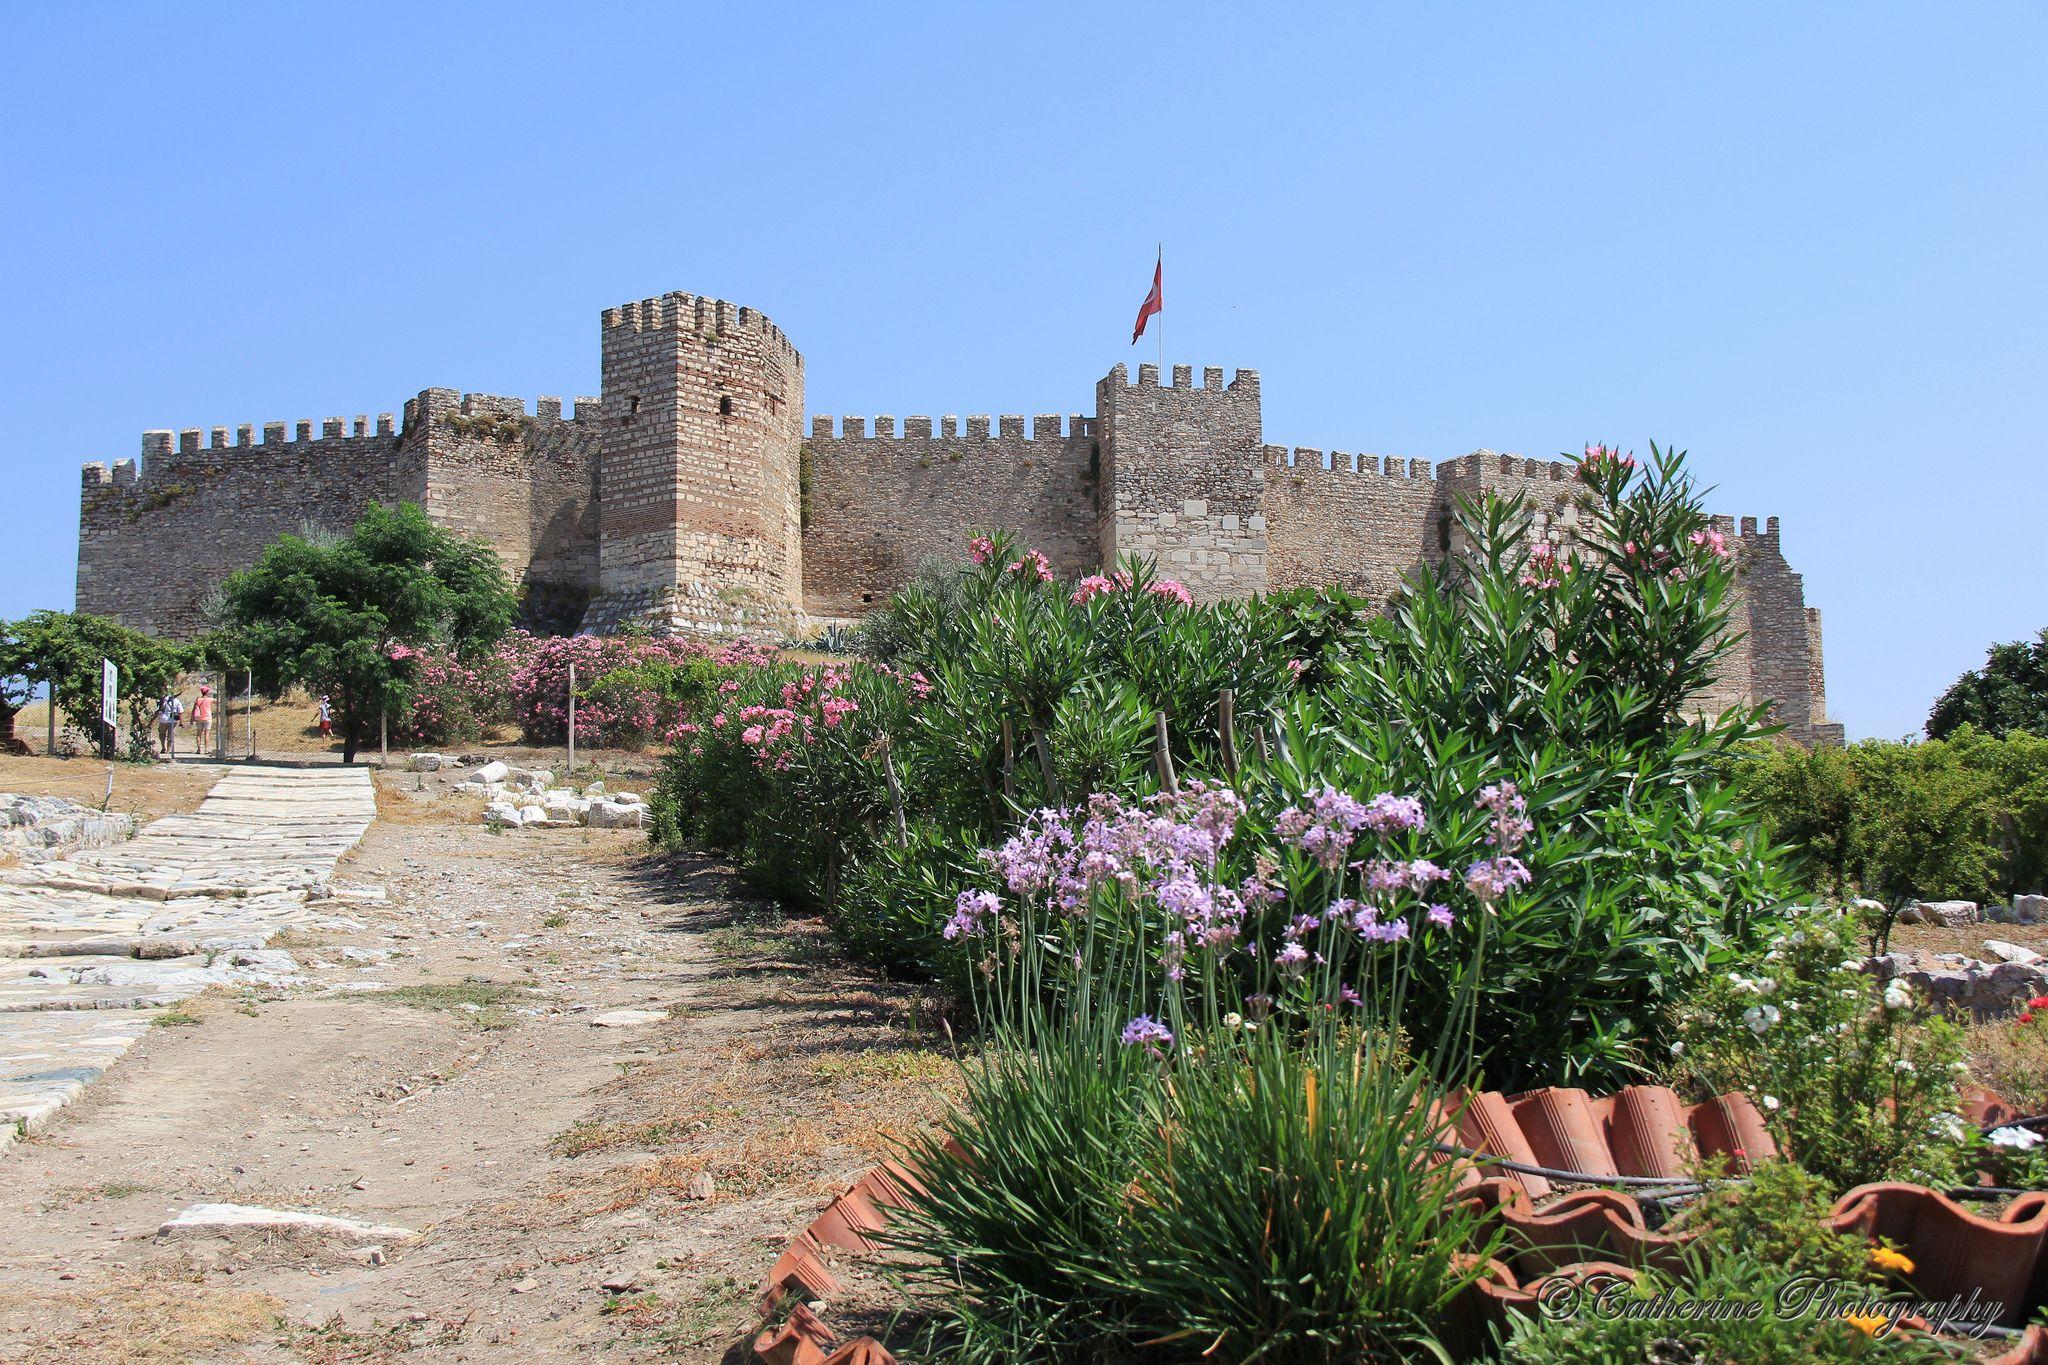 https://flic.kr/p/BgKbUL   Basilica st John, Selcuk   Basilica St John at Selcuk. a well preserved and maintained Roman ruin